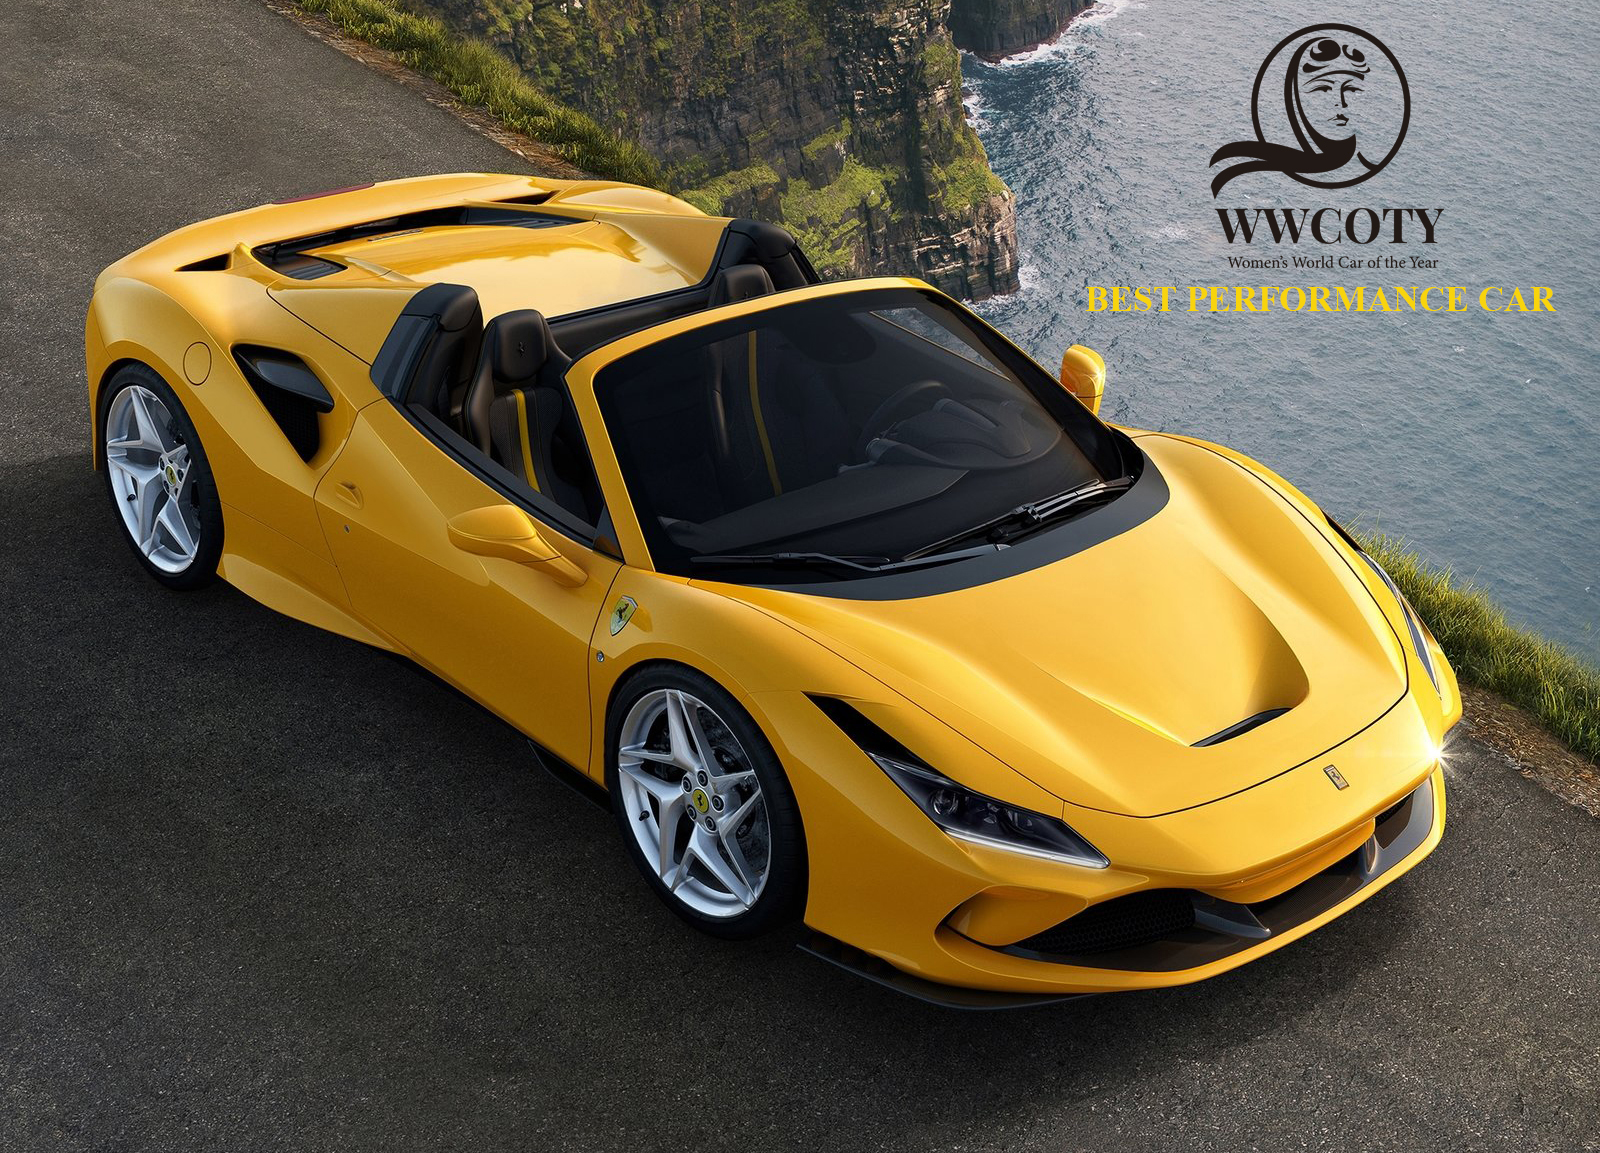 2021-women-world-car-of-the-year-winners-7.jpeg